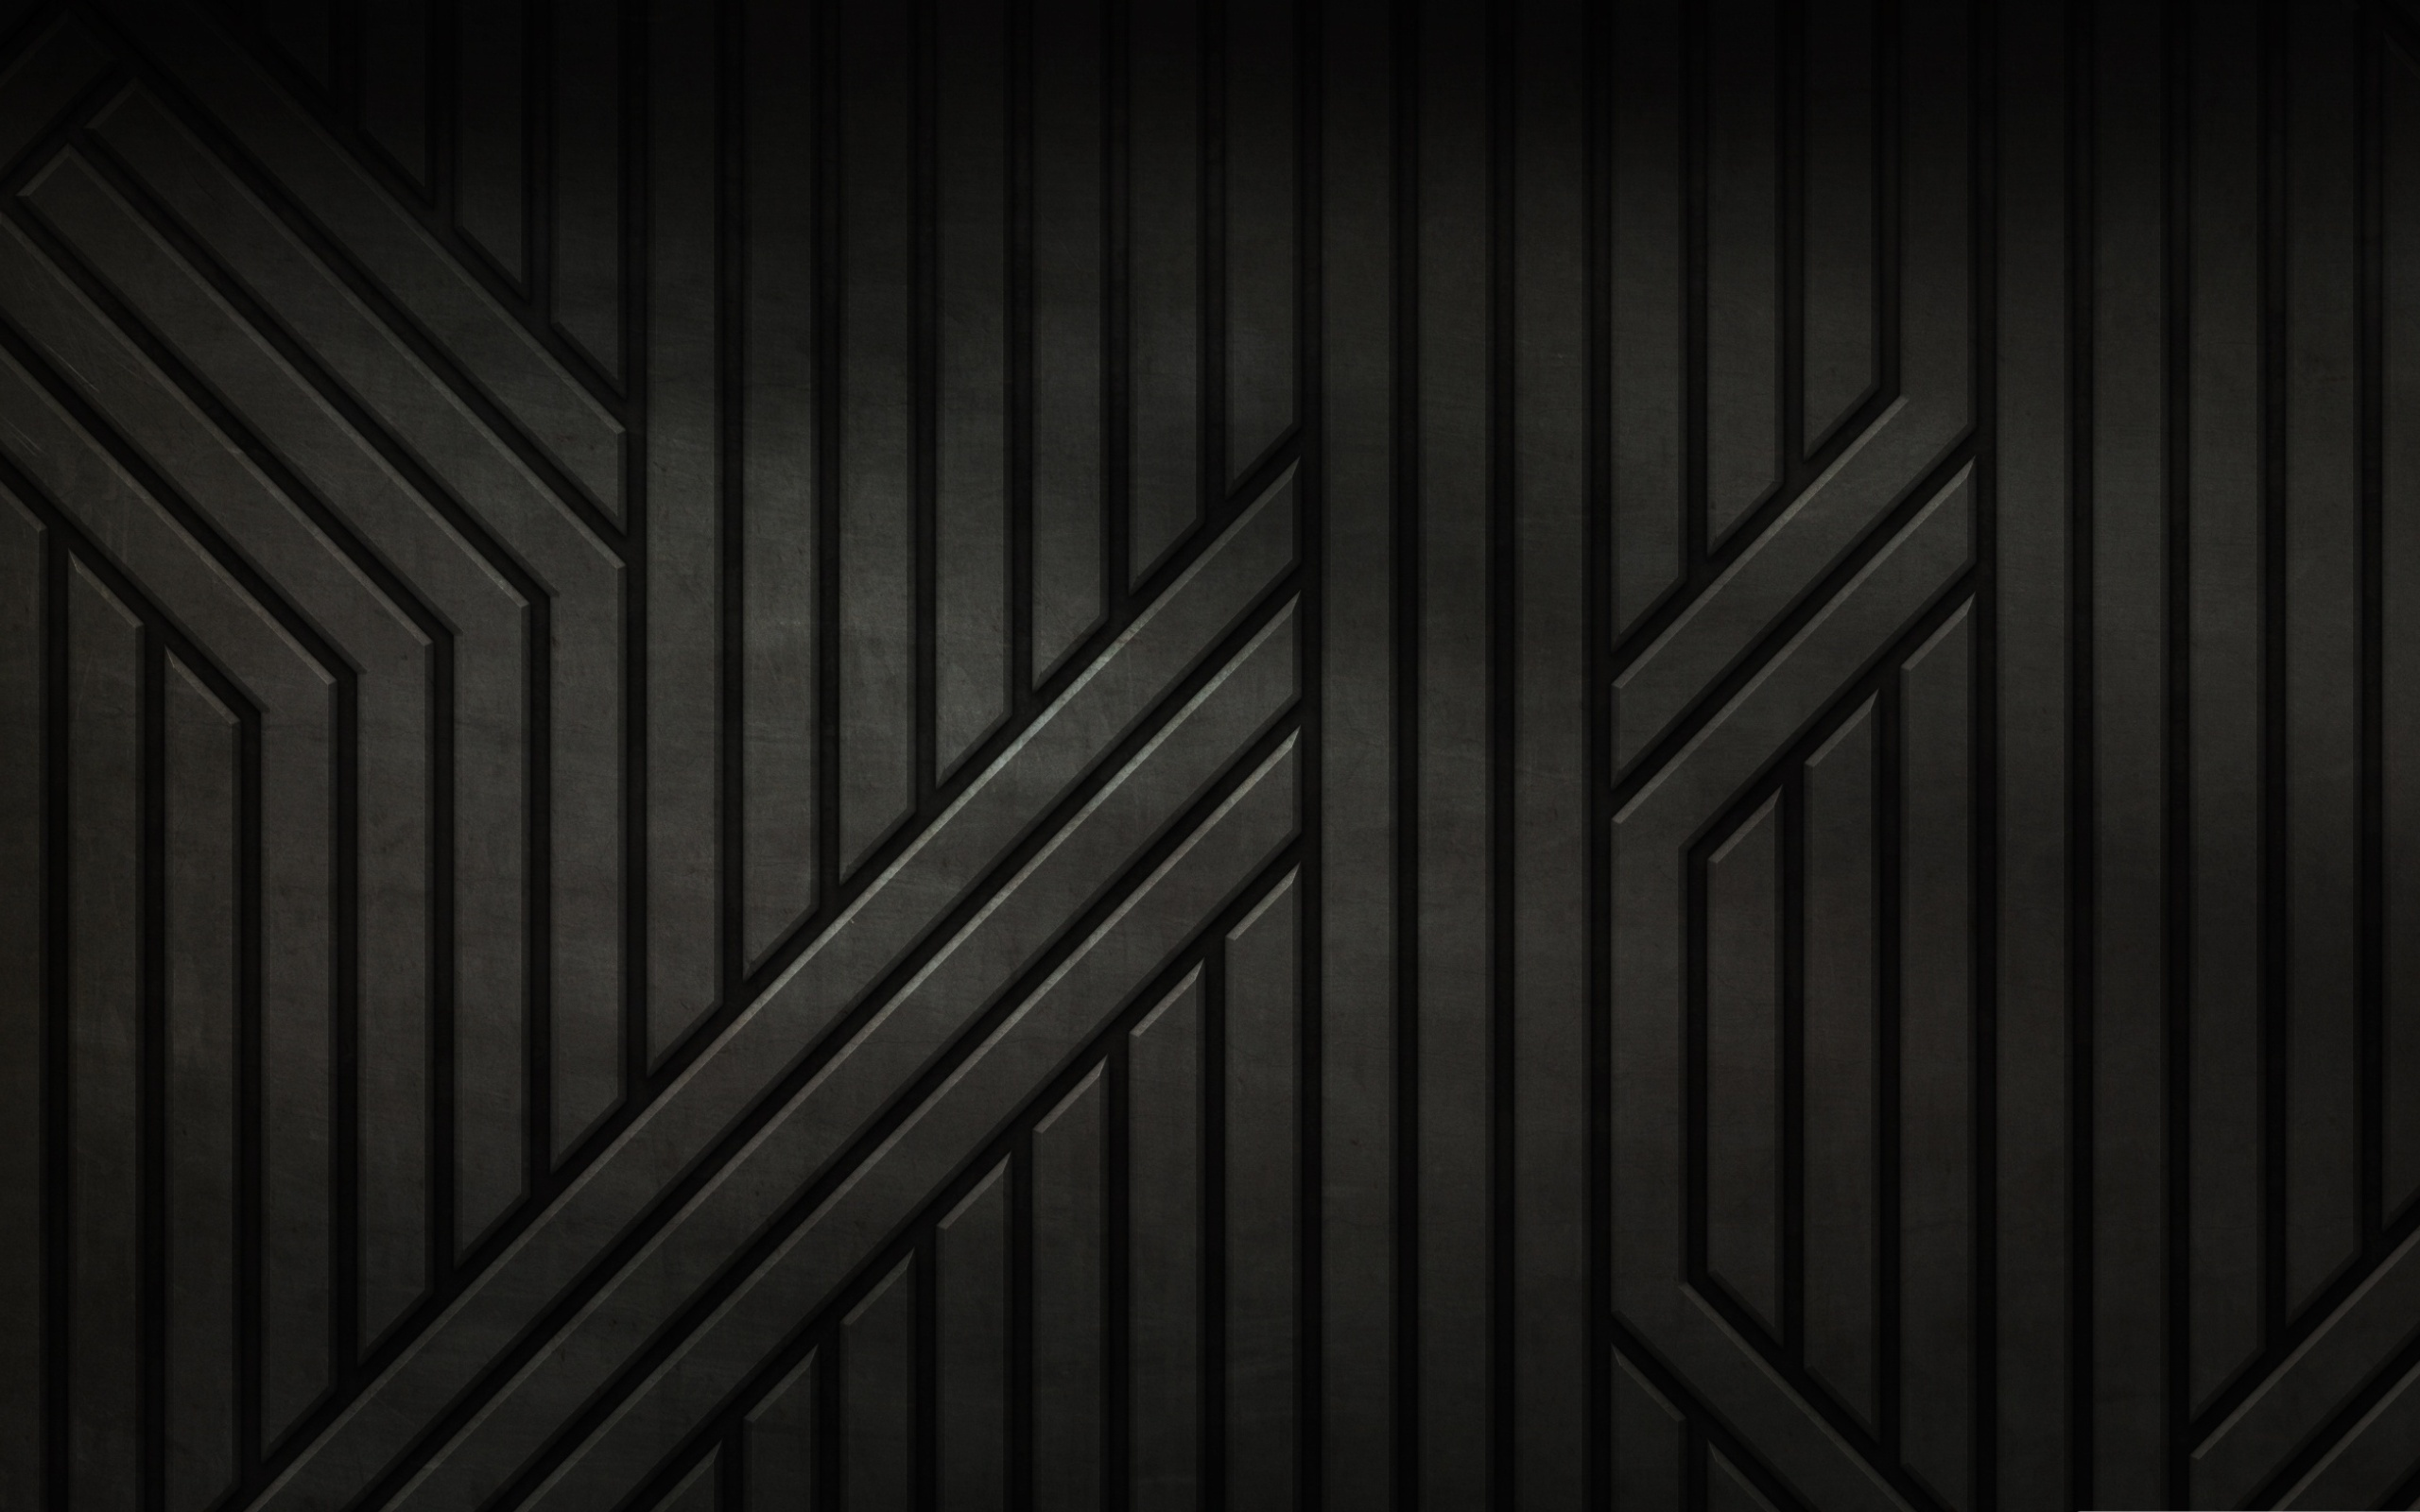 Free Download Texture Wallpaper Hd 2560x1600 For Your Desktop Mobile Tablet Explore 77 Metal Wallpaper Black Metal Wallpaper Heavy Metal Wallpapers Metal Mulisha Wallpaper